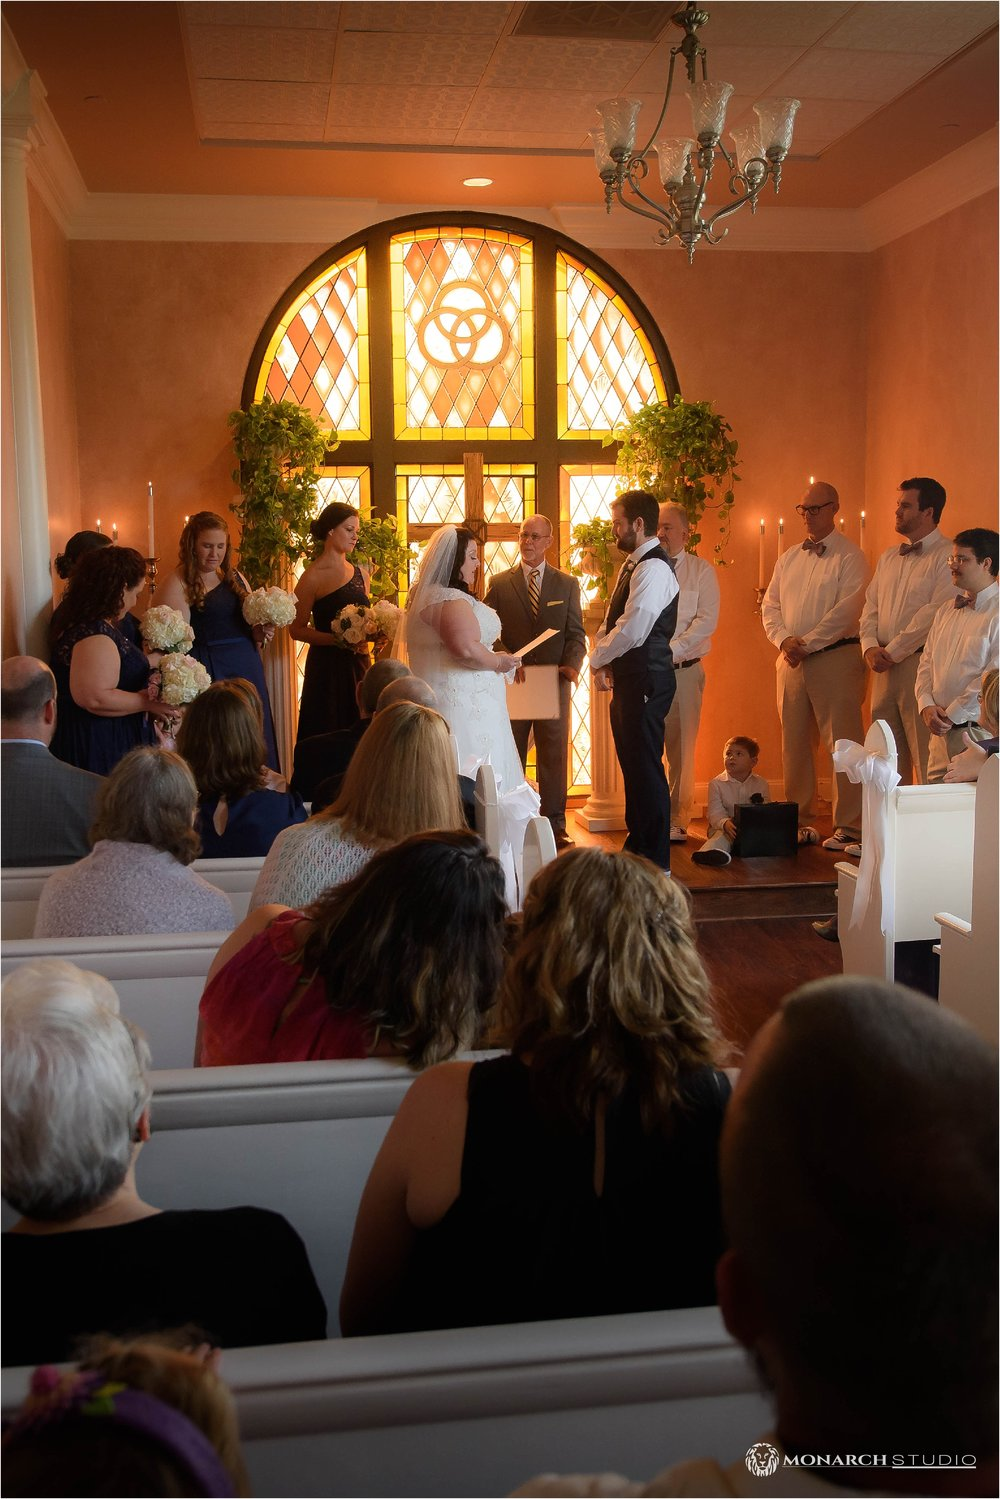 st-augustine-photographer-intimate-wedding-023.jpg